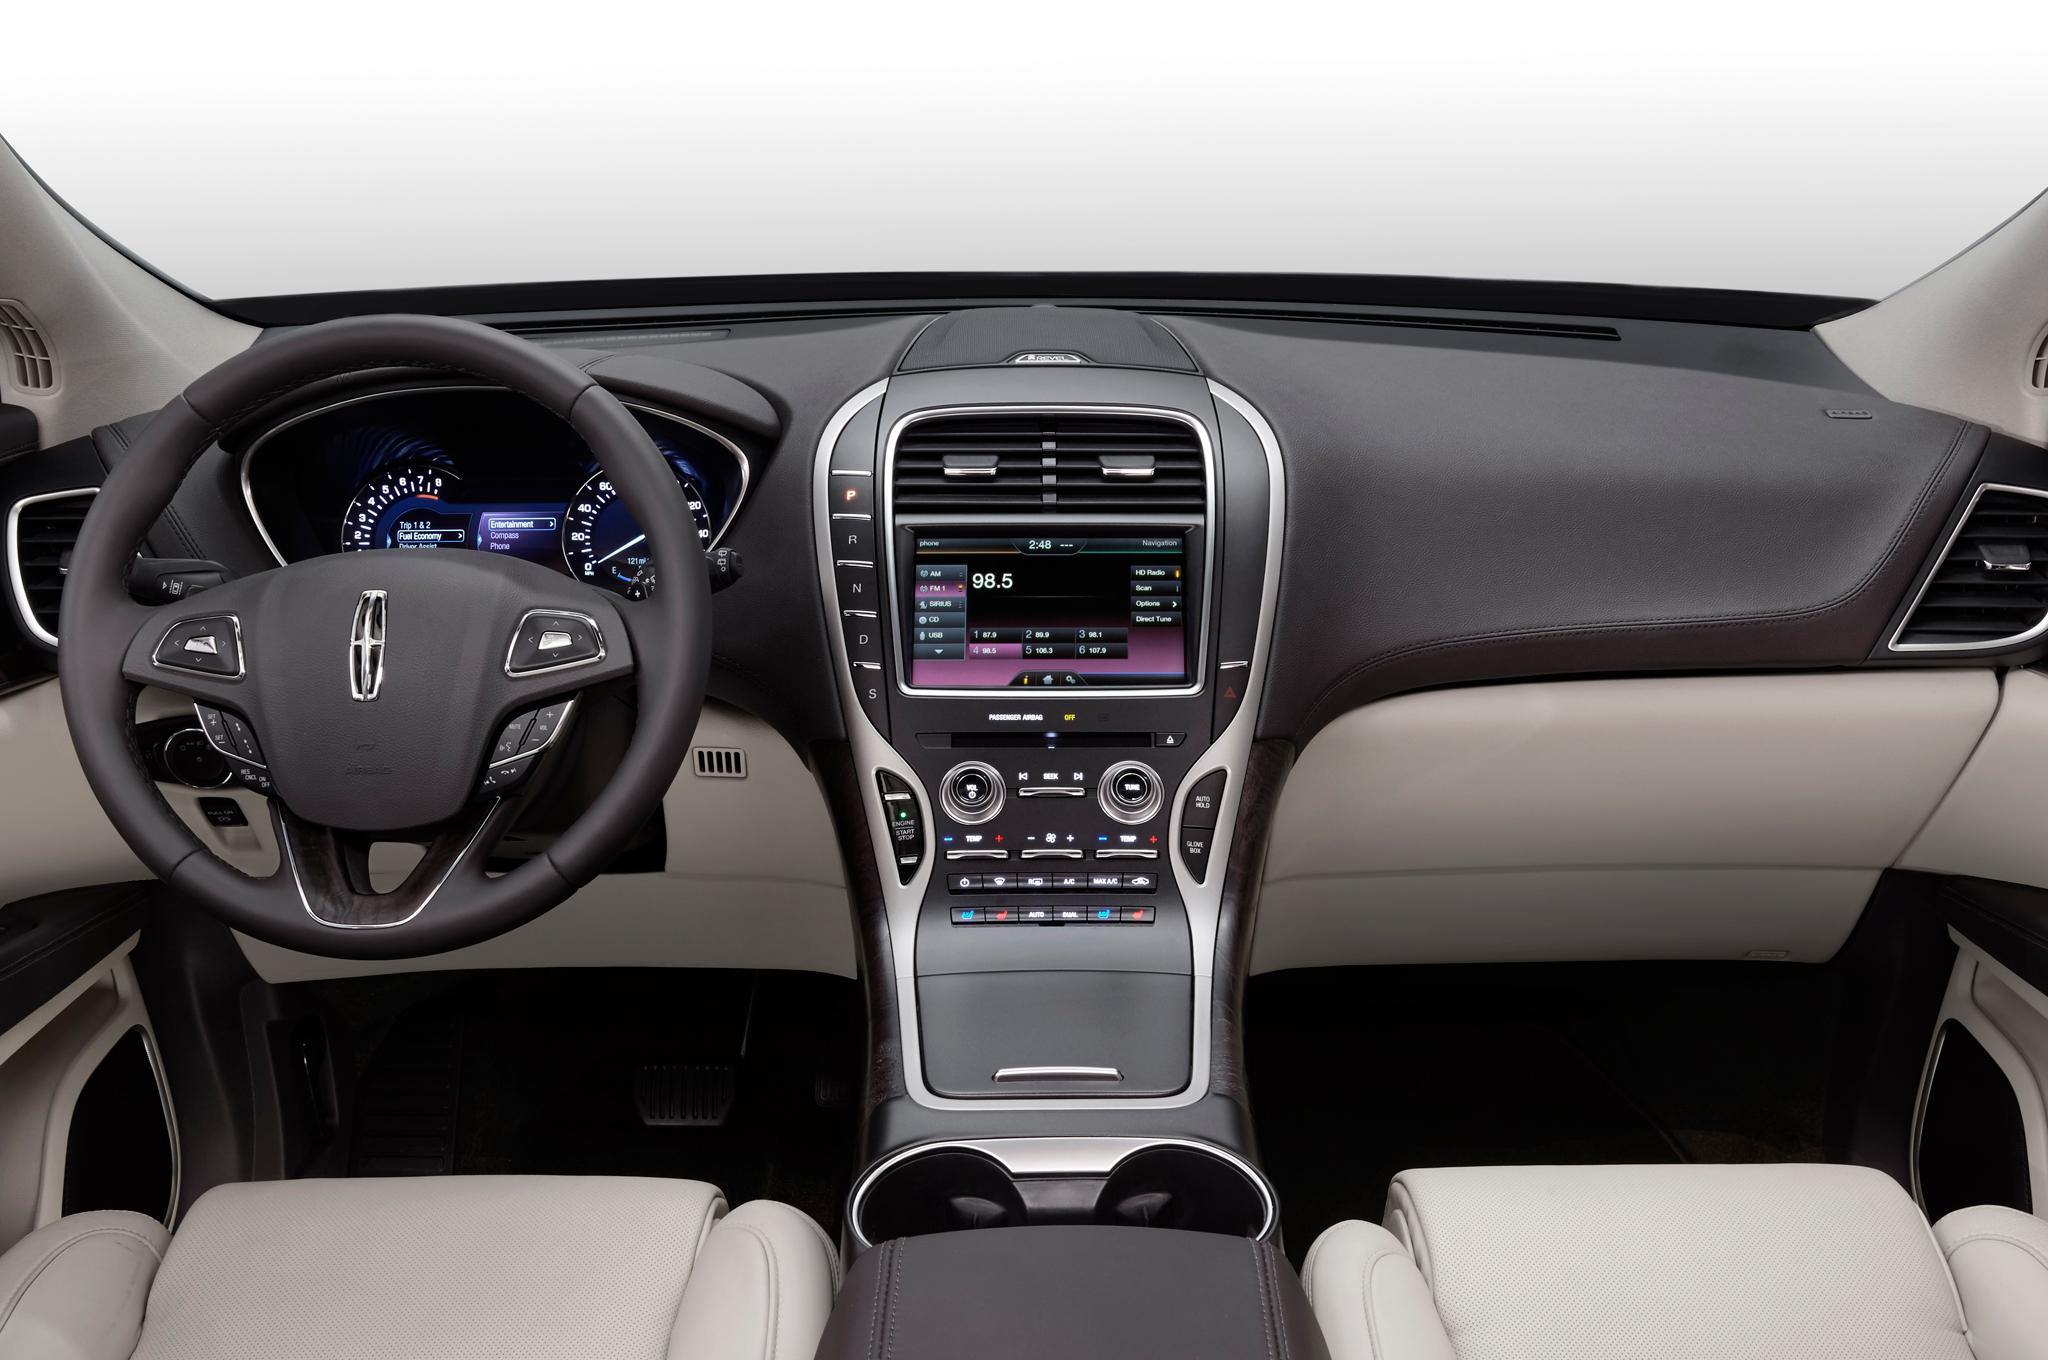 2016 Lincoln MKX Interior and Dashboard